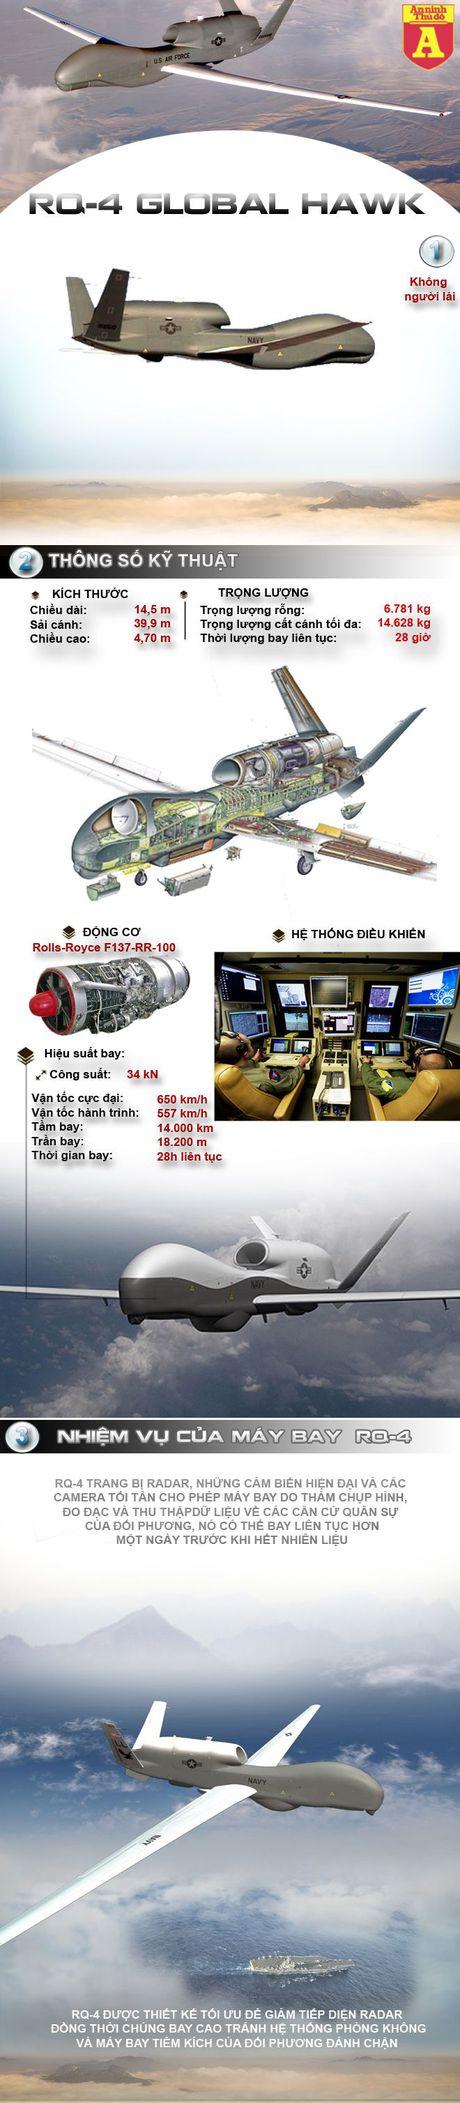 RQ-4 Global Hawk - Mat than thay the huyen thoai U-2 cua My - Anh 1